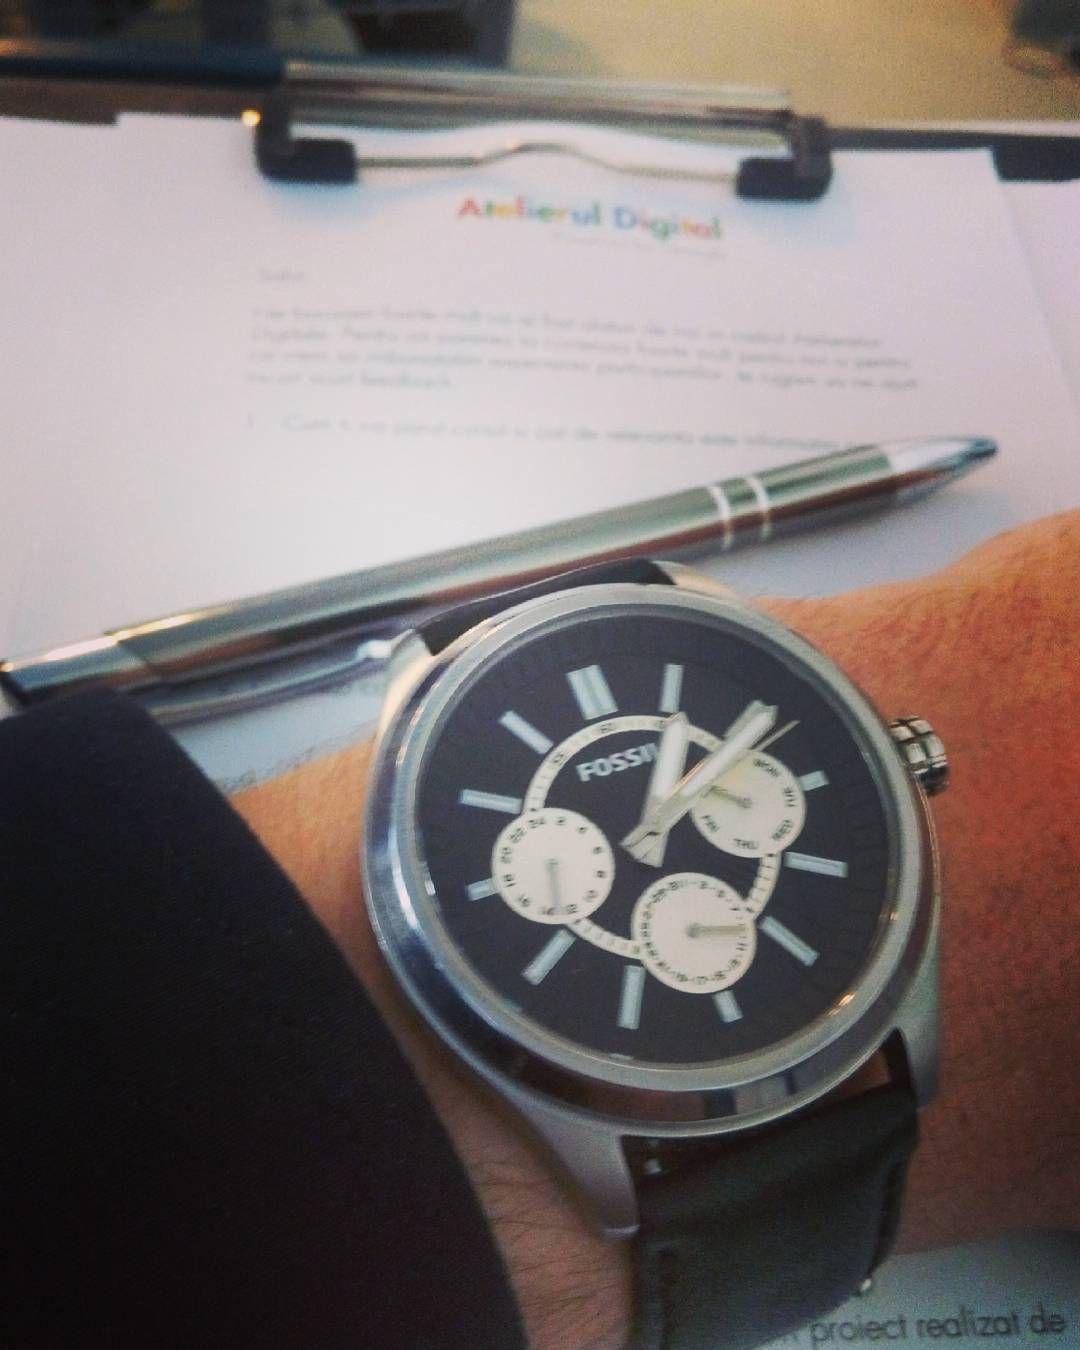 Saturday @ Uni #Google #atelieruldigital #seo #marketing #fossil #watchlover #learning by stefan.nicu